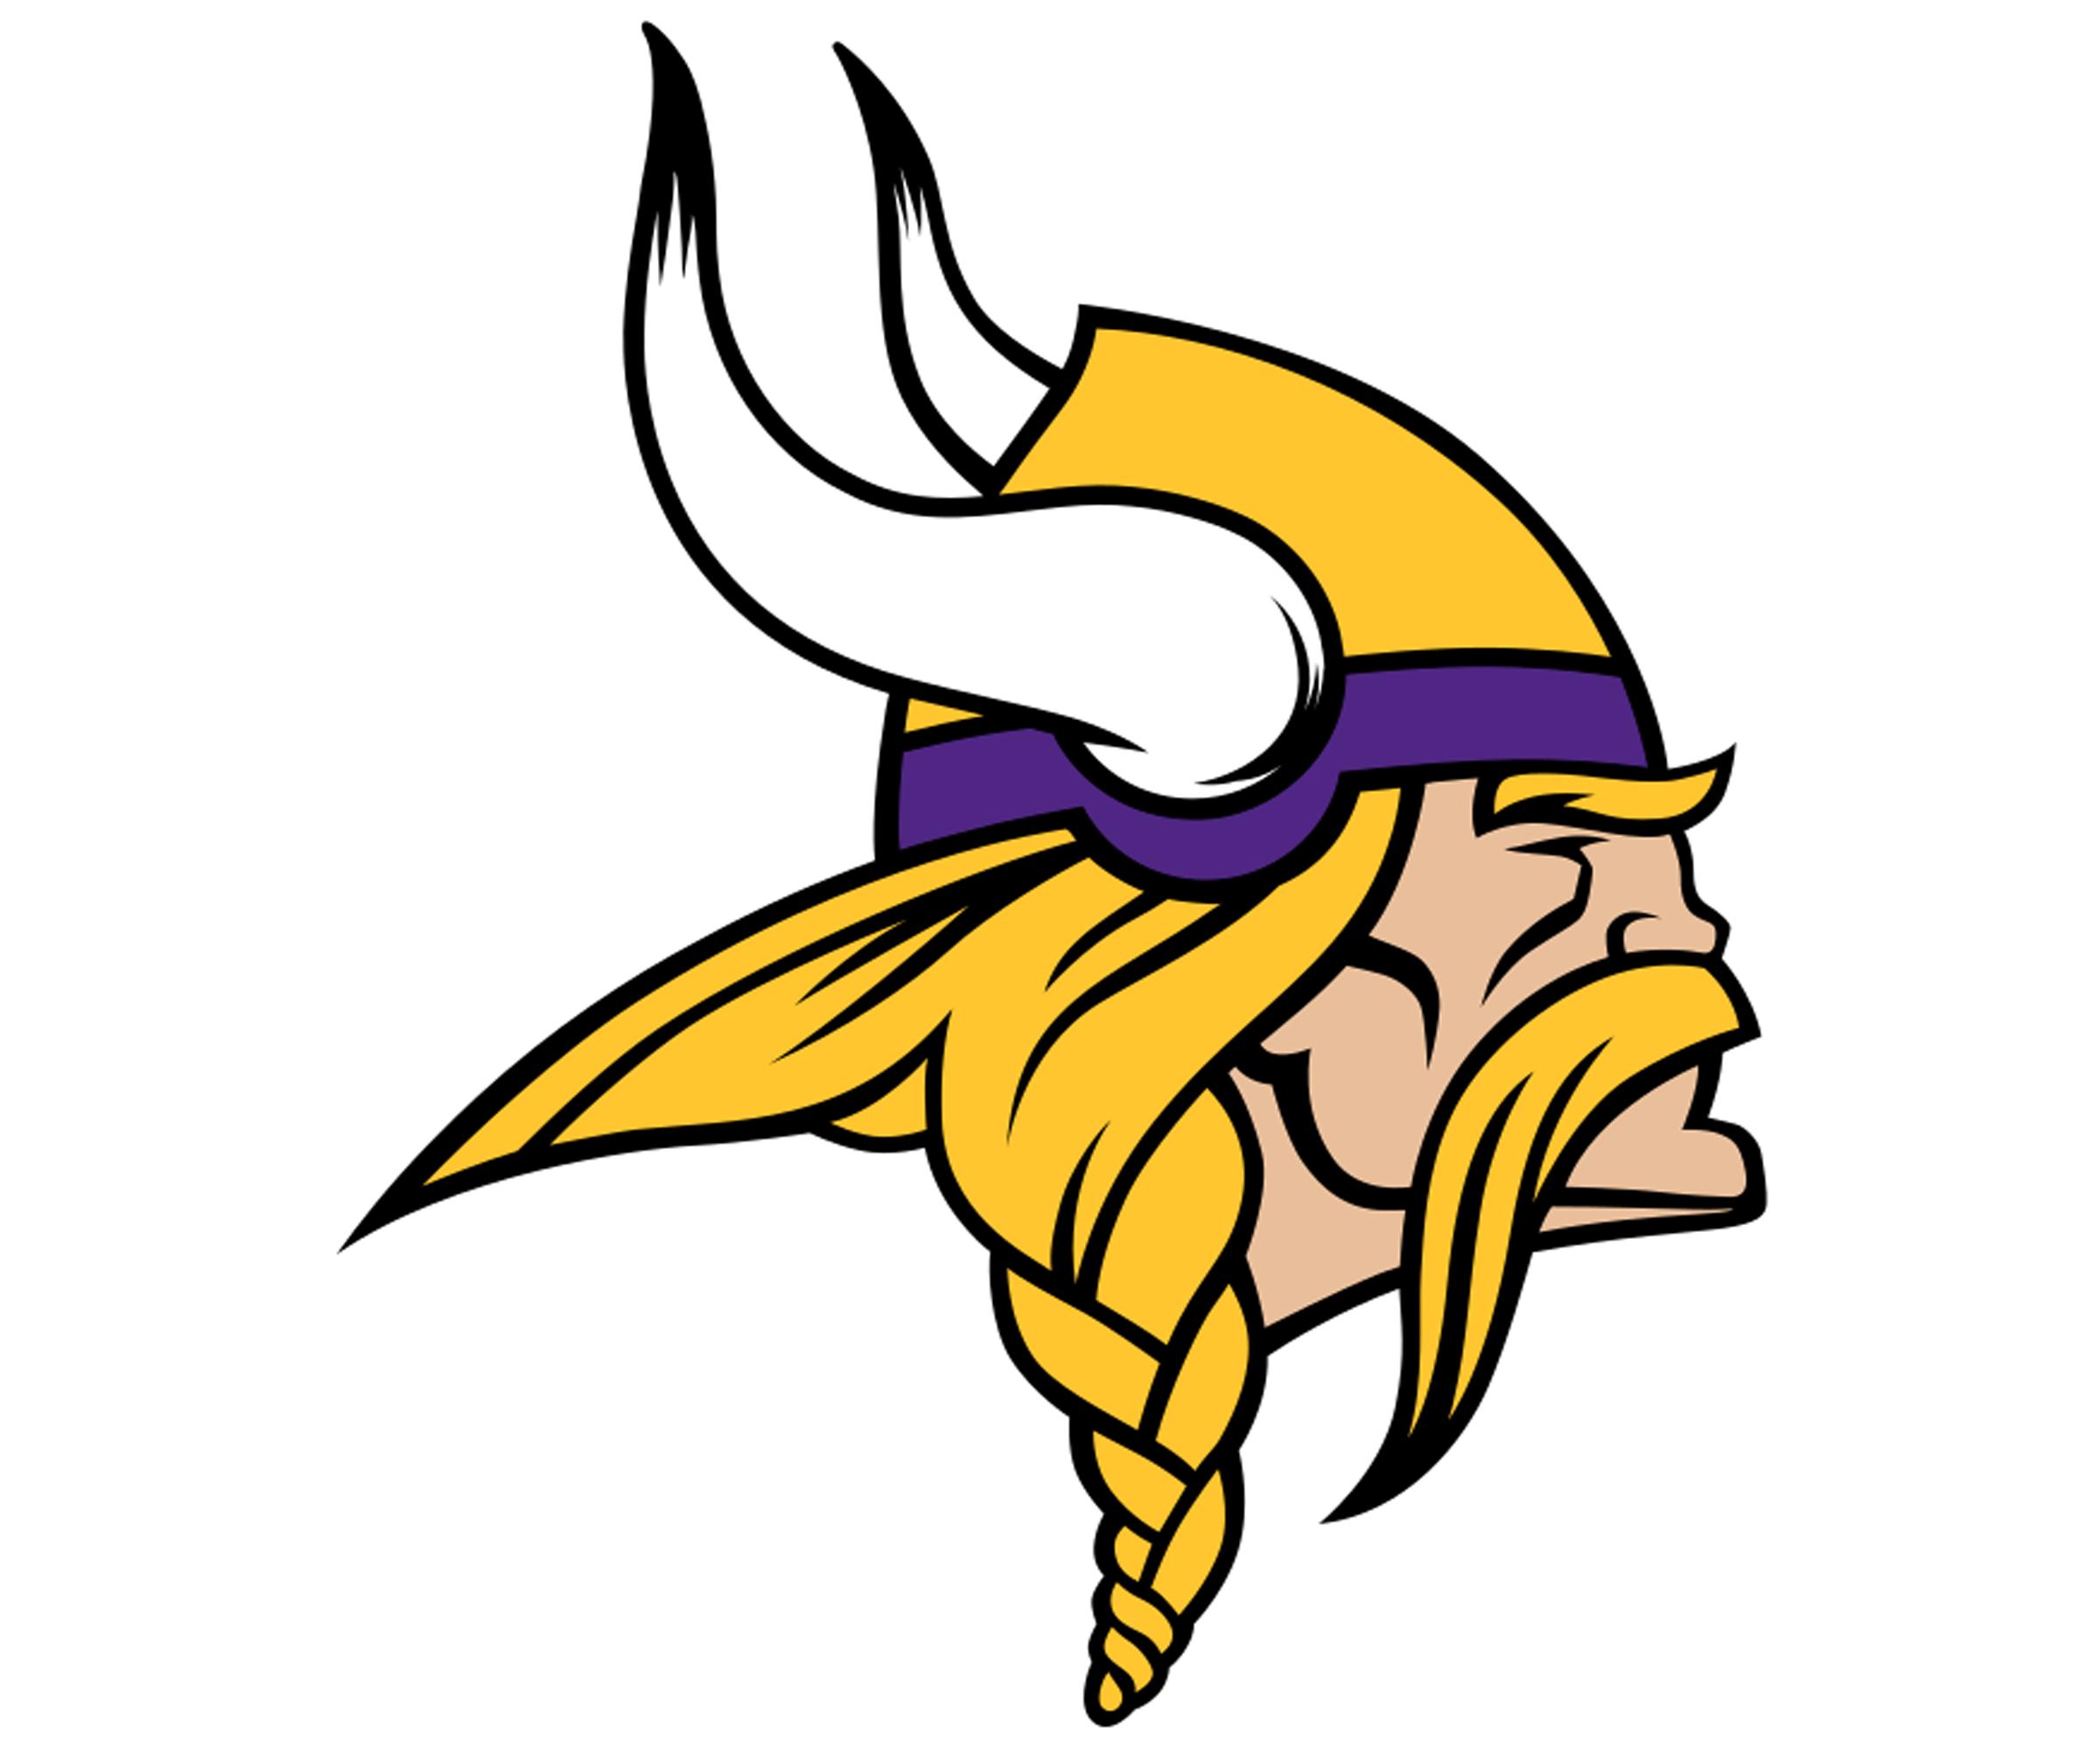 Minnesota Vikings - 0.28% INTERACTION RATE - FACEBOOK(vs. 0.08% league average)